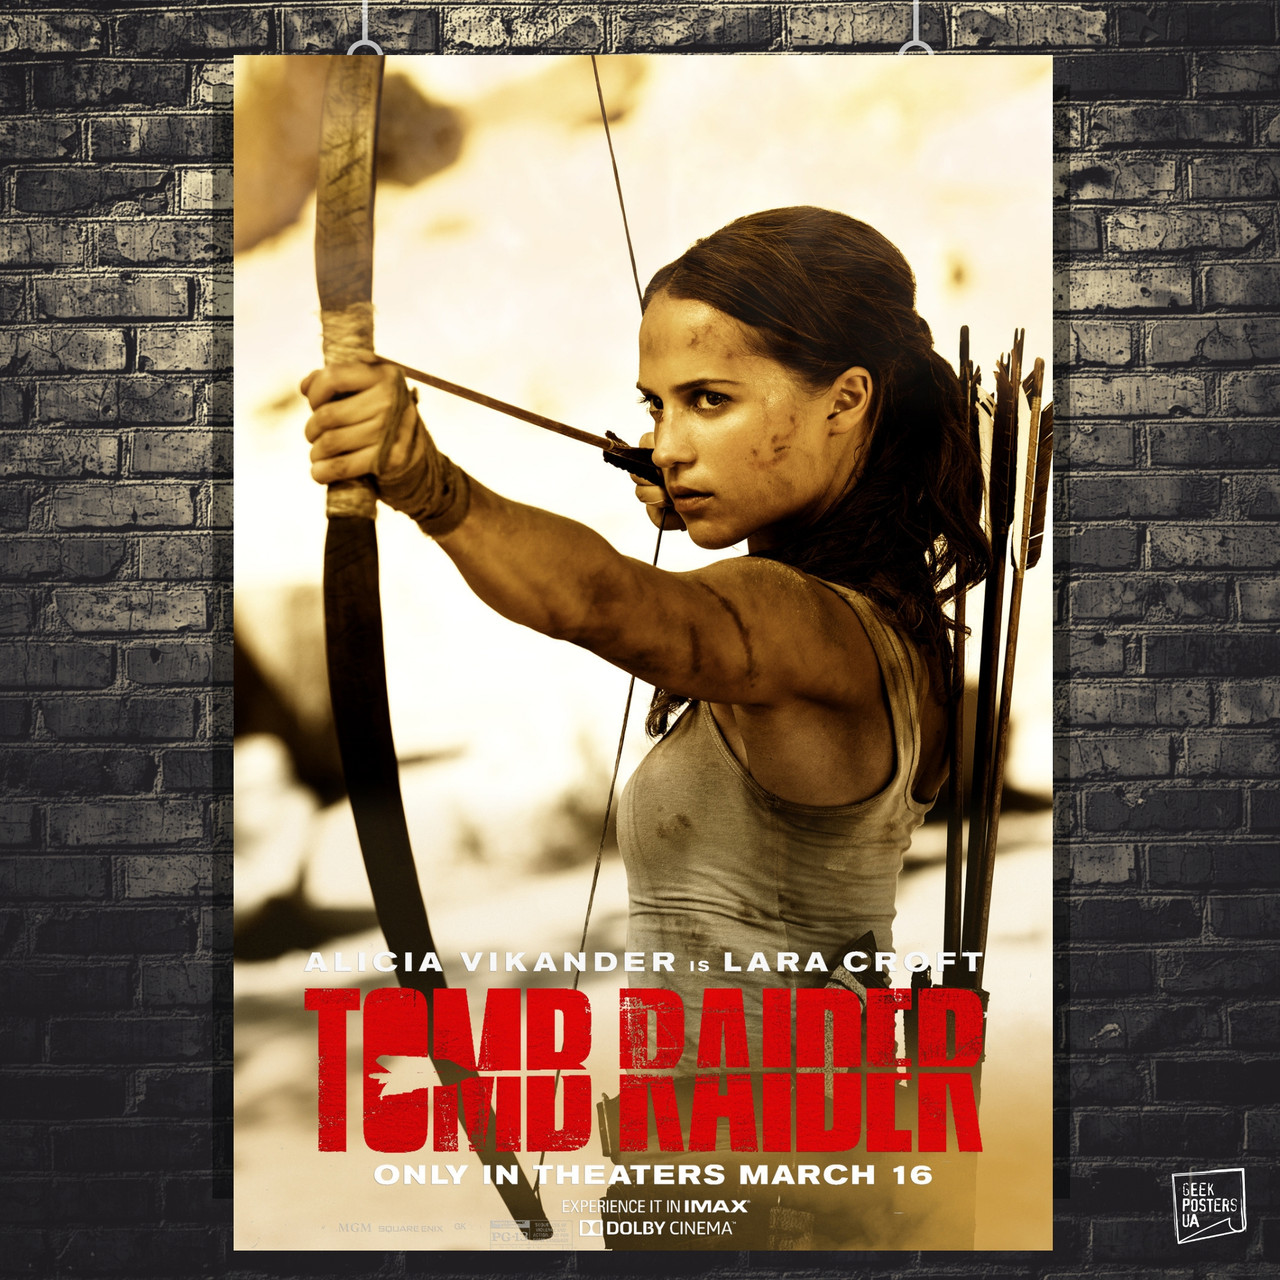 Постер Tomb Raider, Лара Крофт, Томб Райдер. Размер 60x42см (A2). Глянцевая бумага